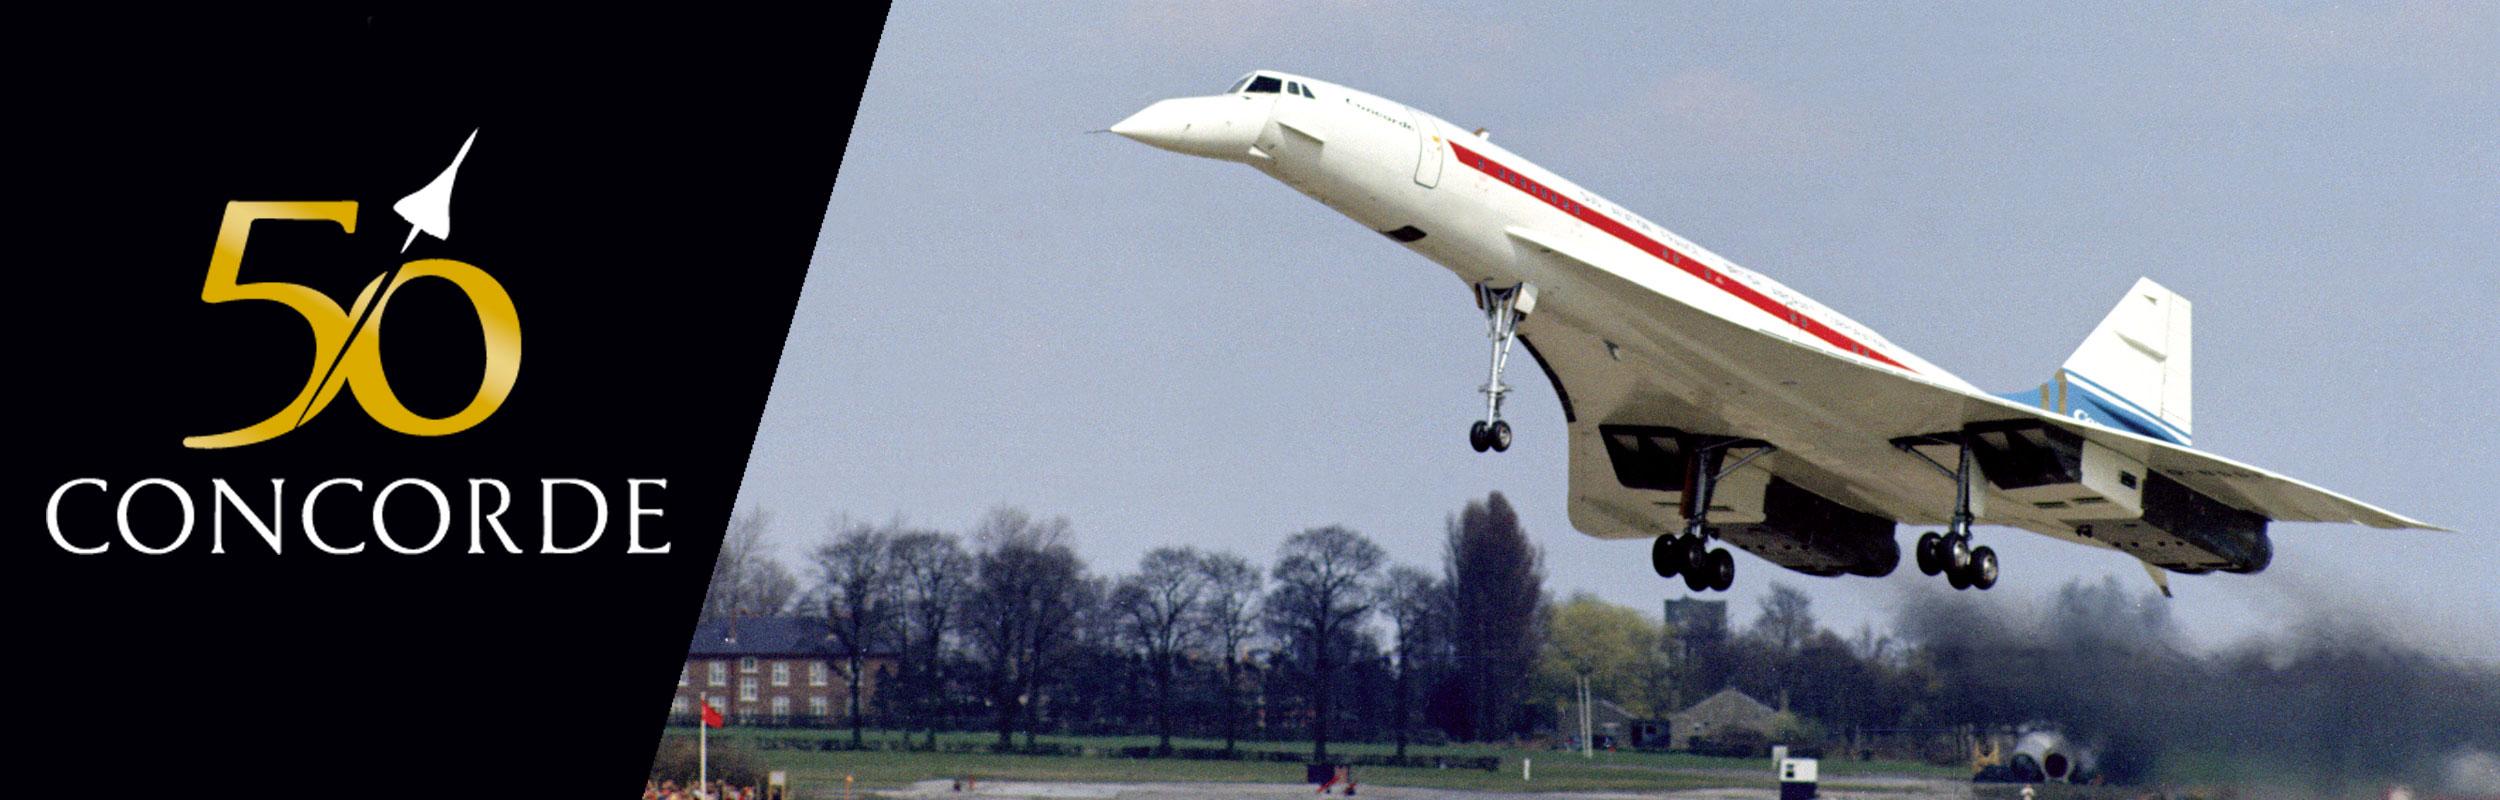 Concorde50-header2.jpg